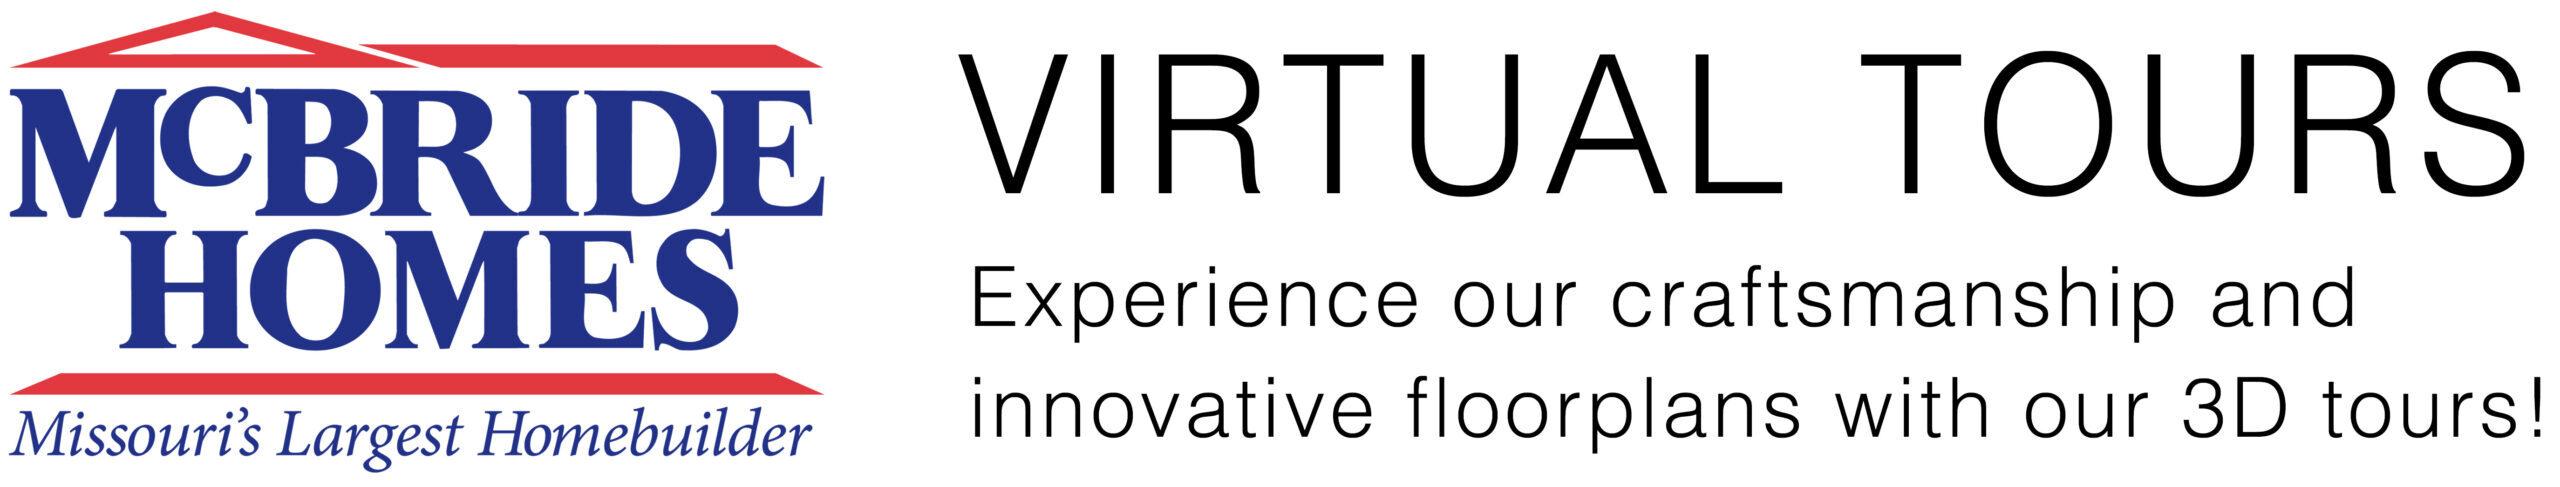 McBride Virtual Tours